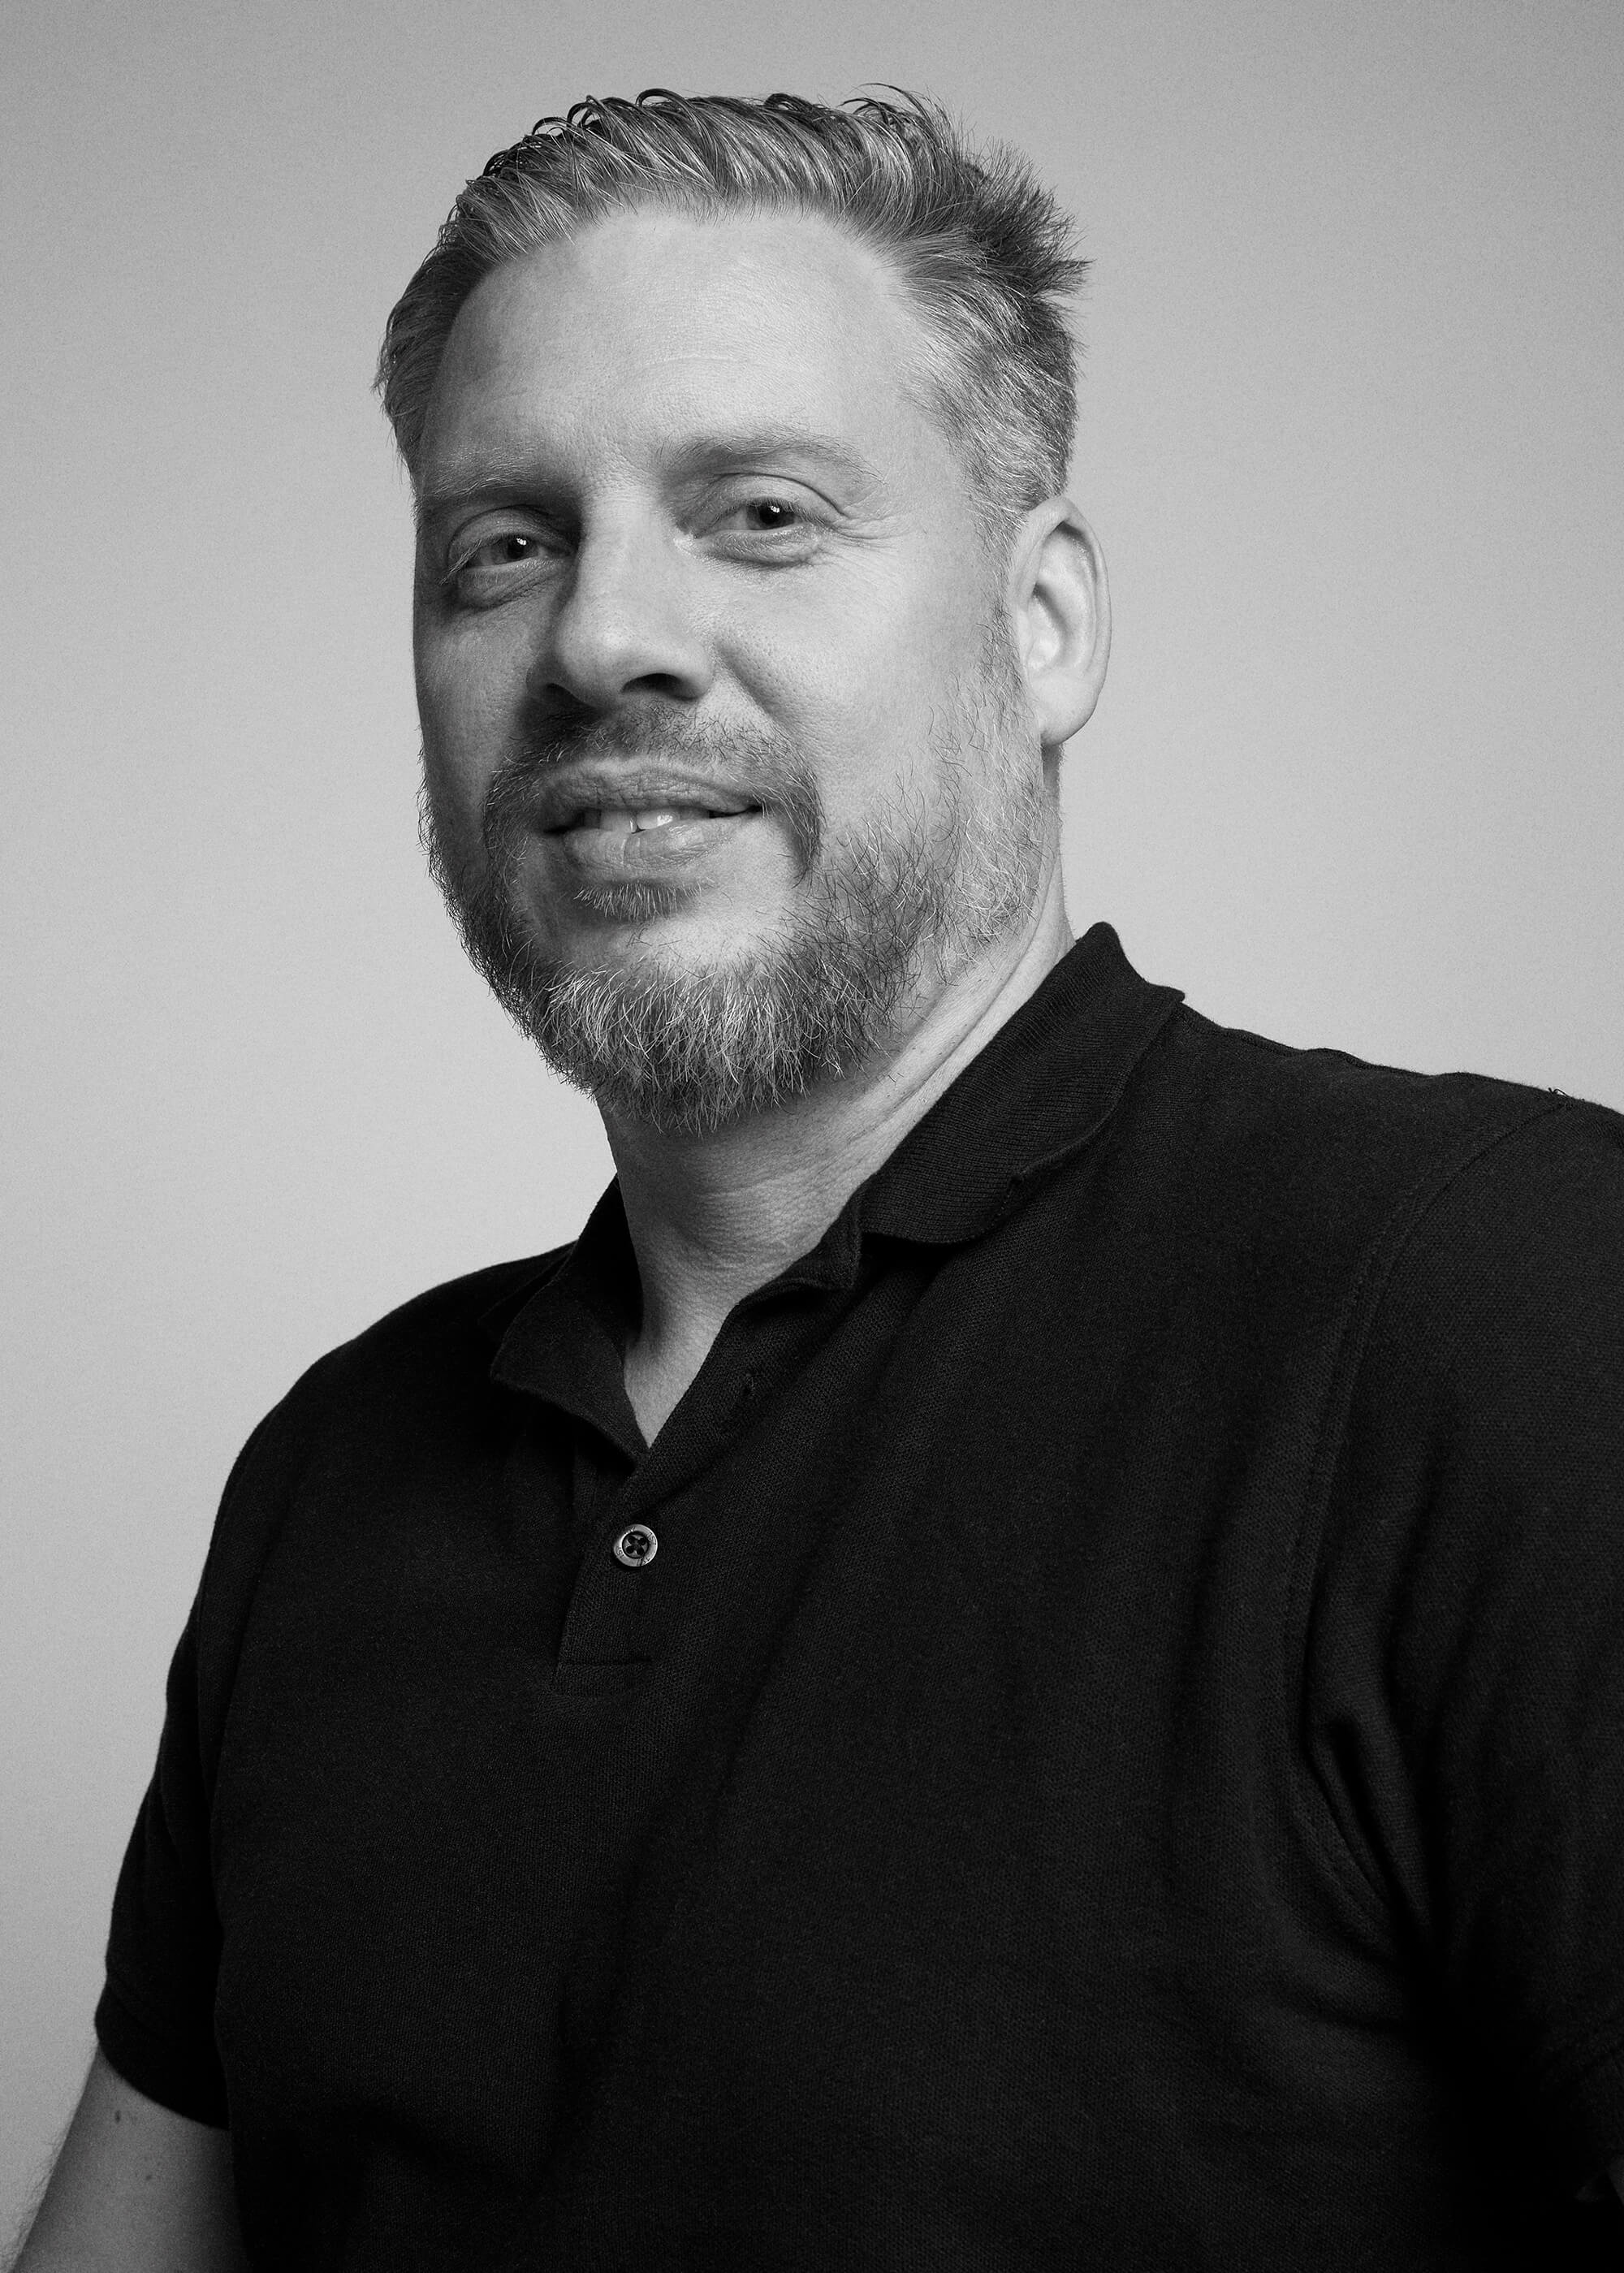 Michael Embretsen